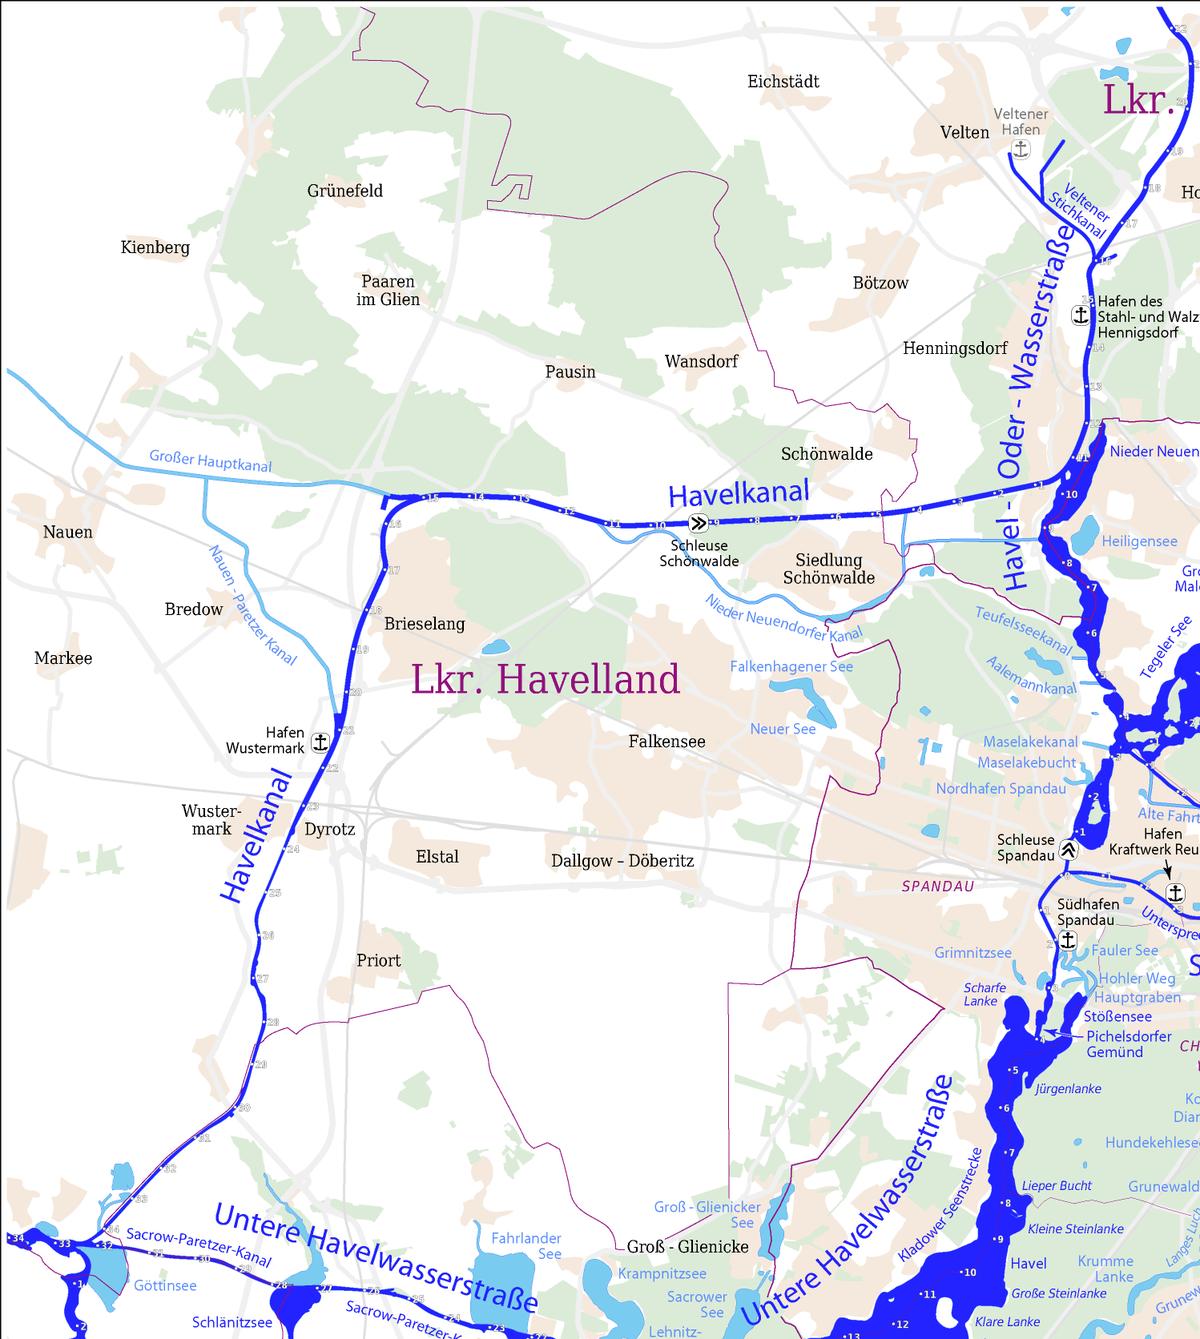 Rhein herne kanal - 5 6